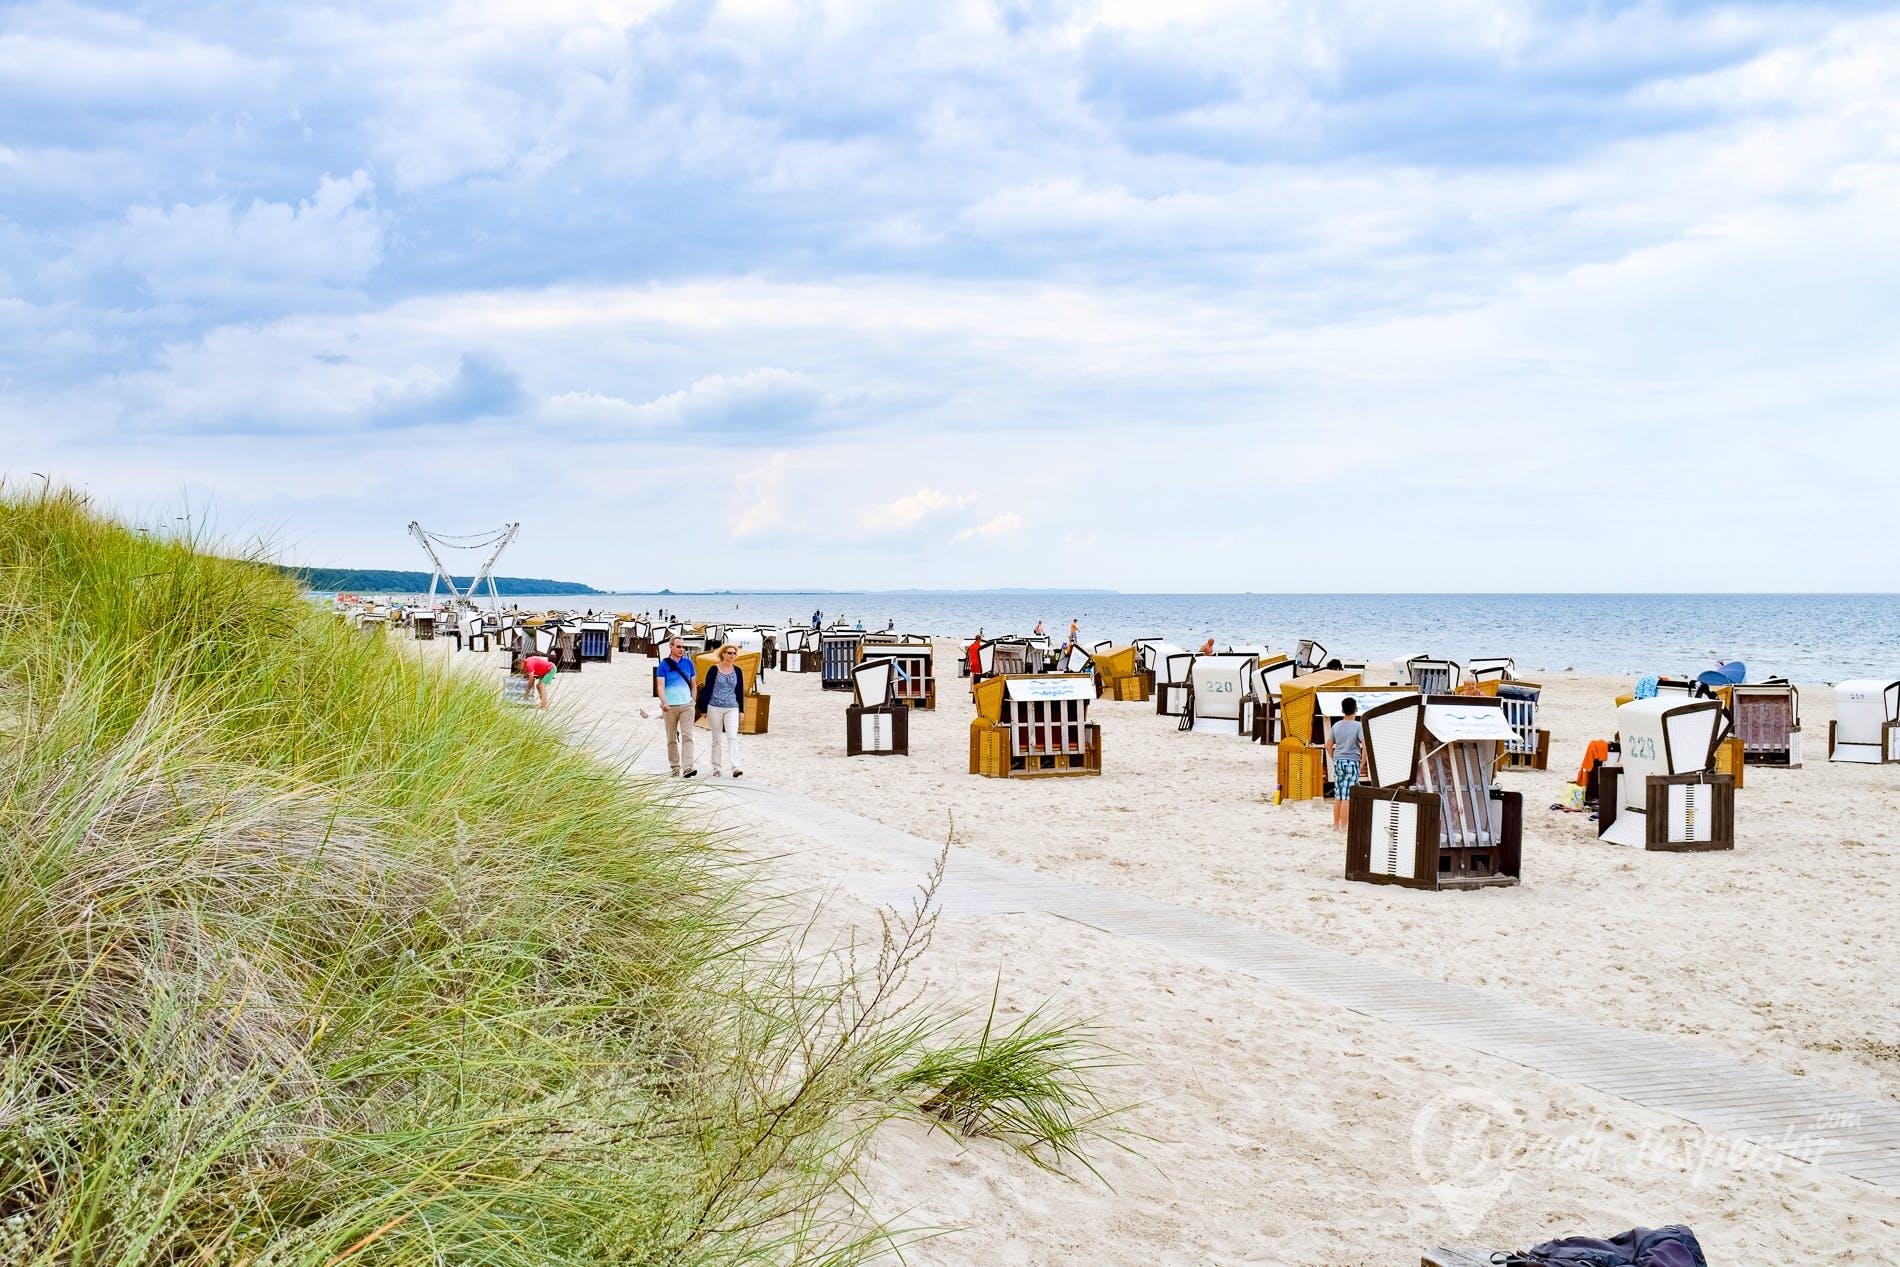 Beach Ostseebad Karlshagen, Usedom, Germany